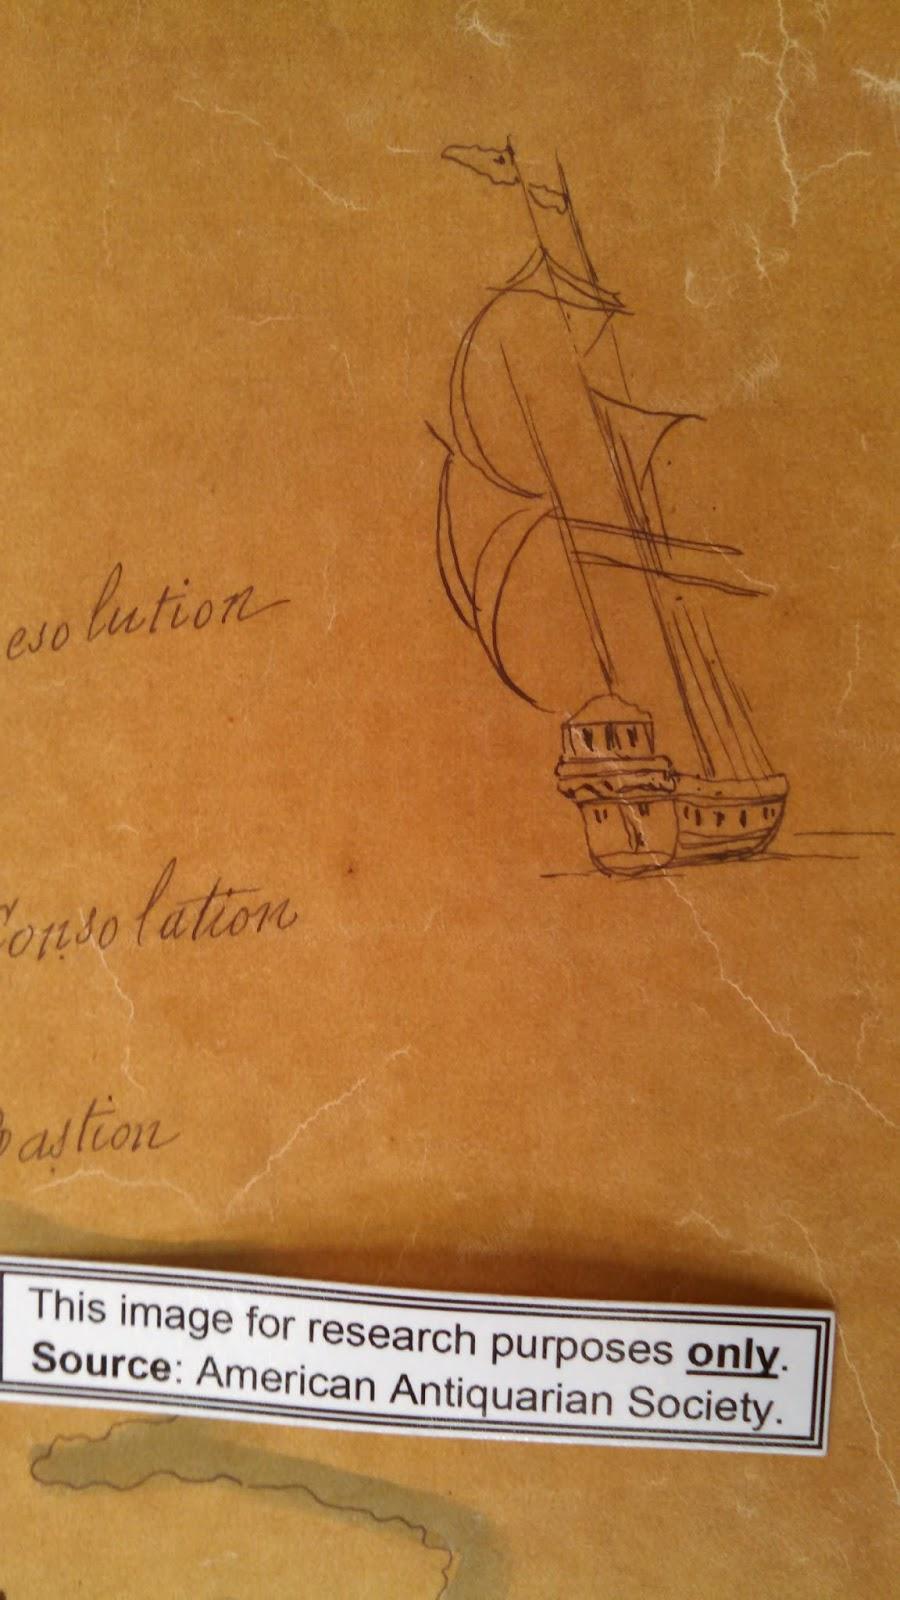 small sketch of a sailing ship